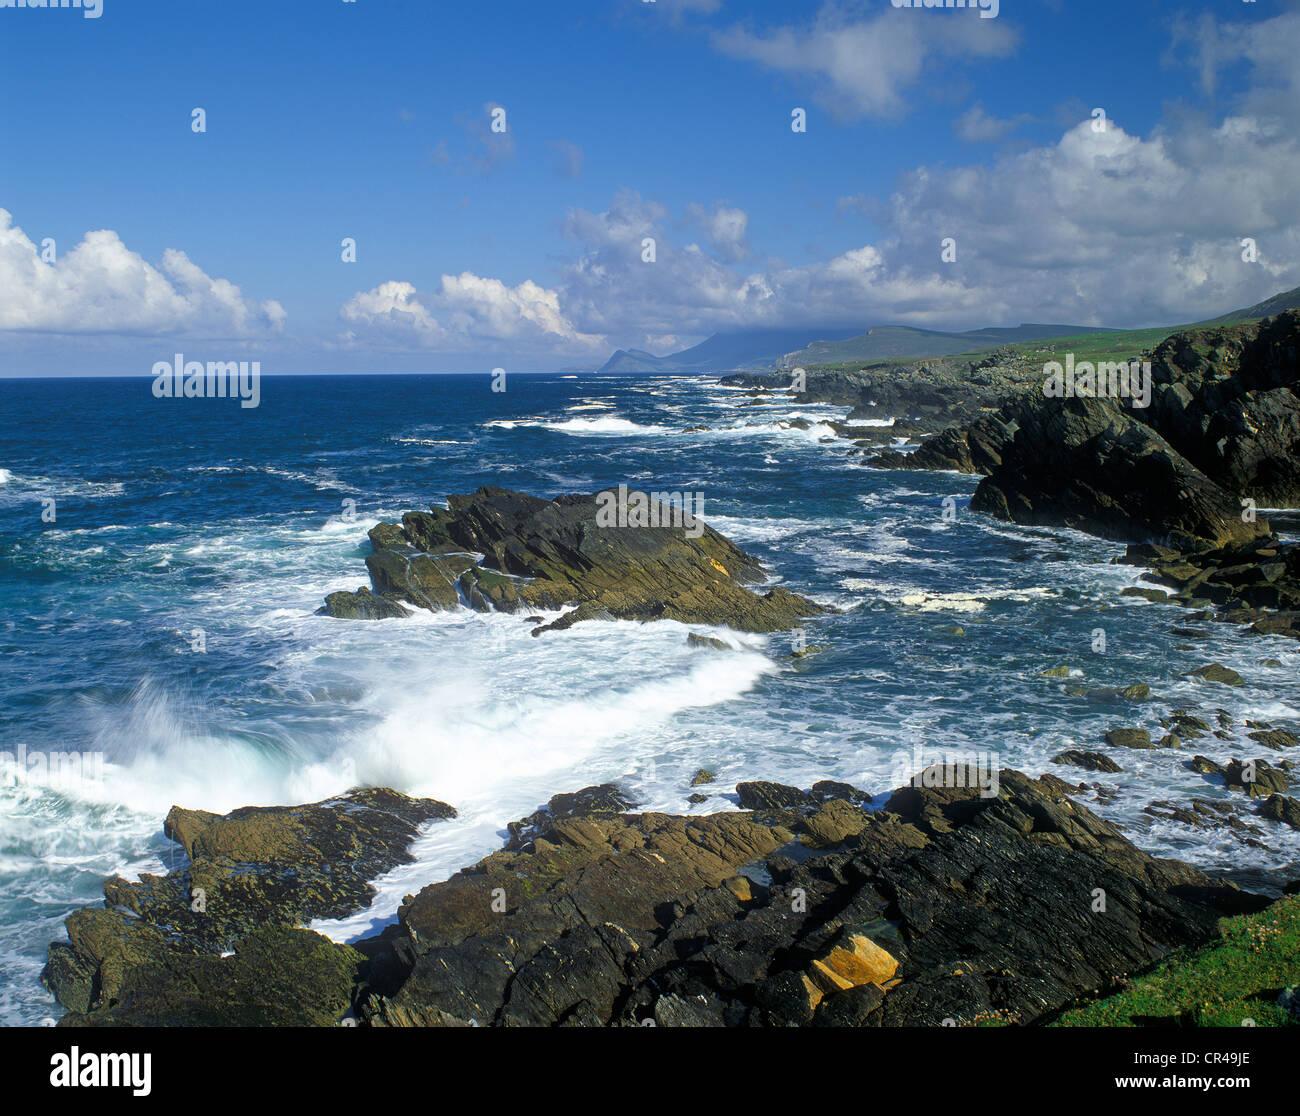 Coast, Slieve More, Atlantic Drive, County Mayo, Republic of Ireland, Europe Stock Photo